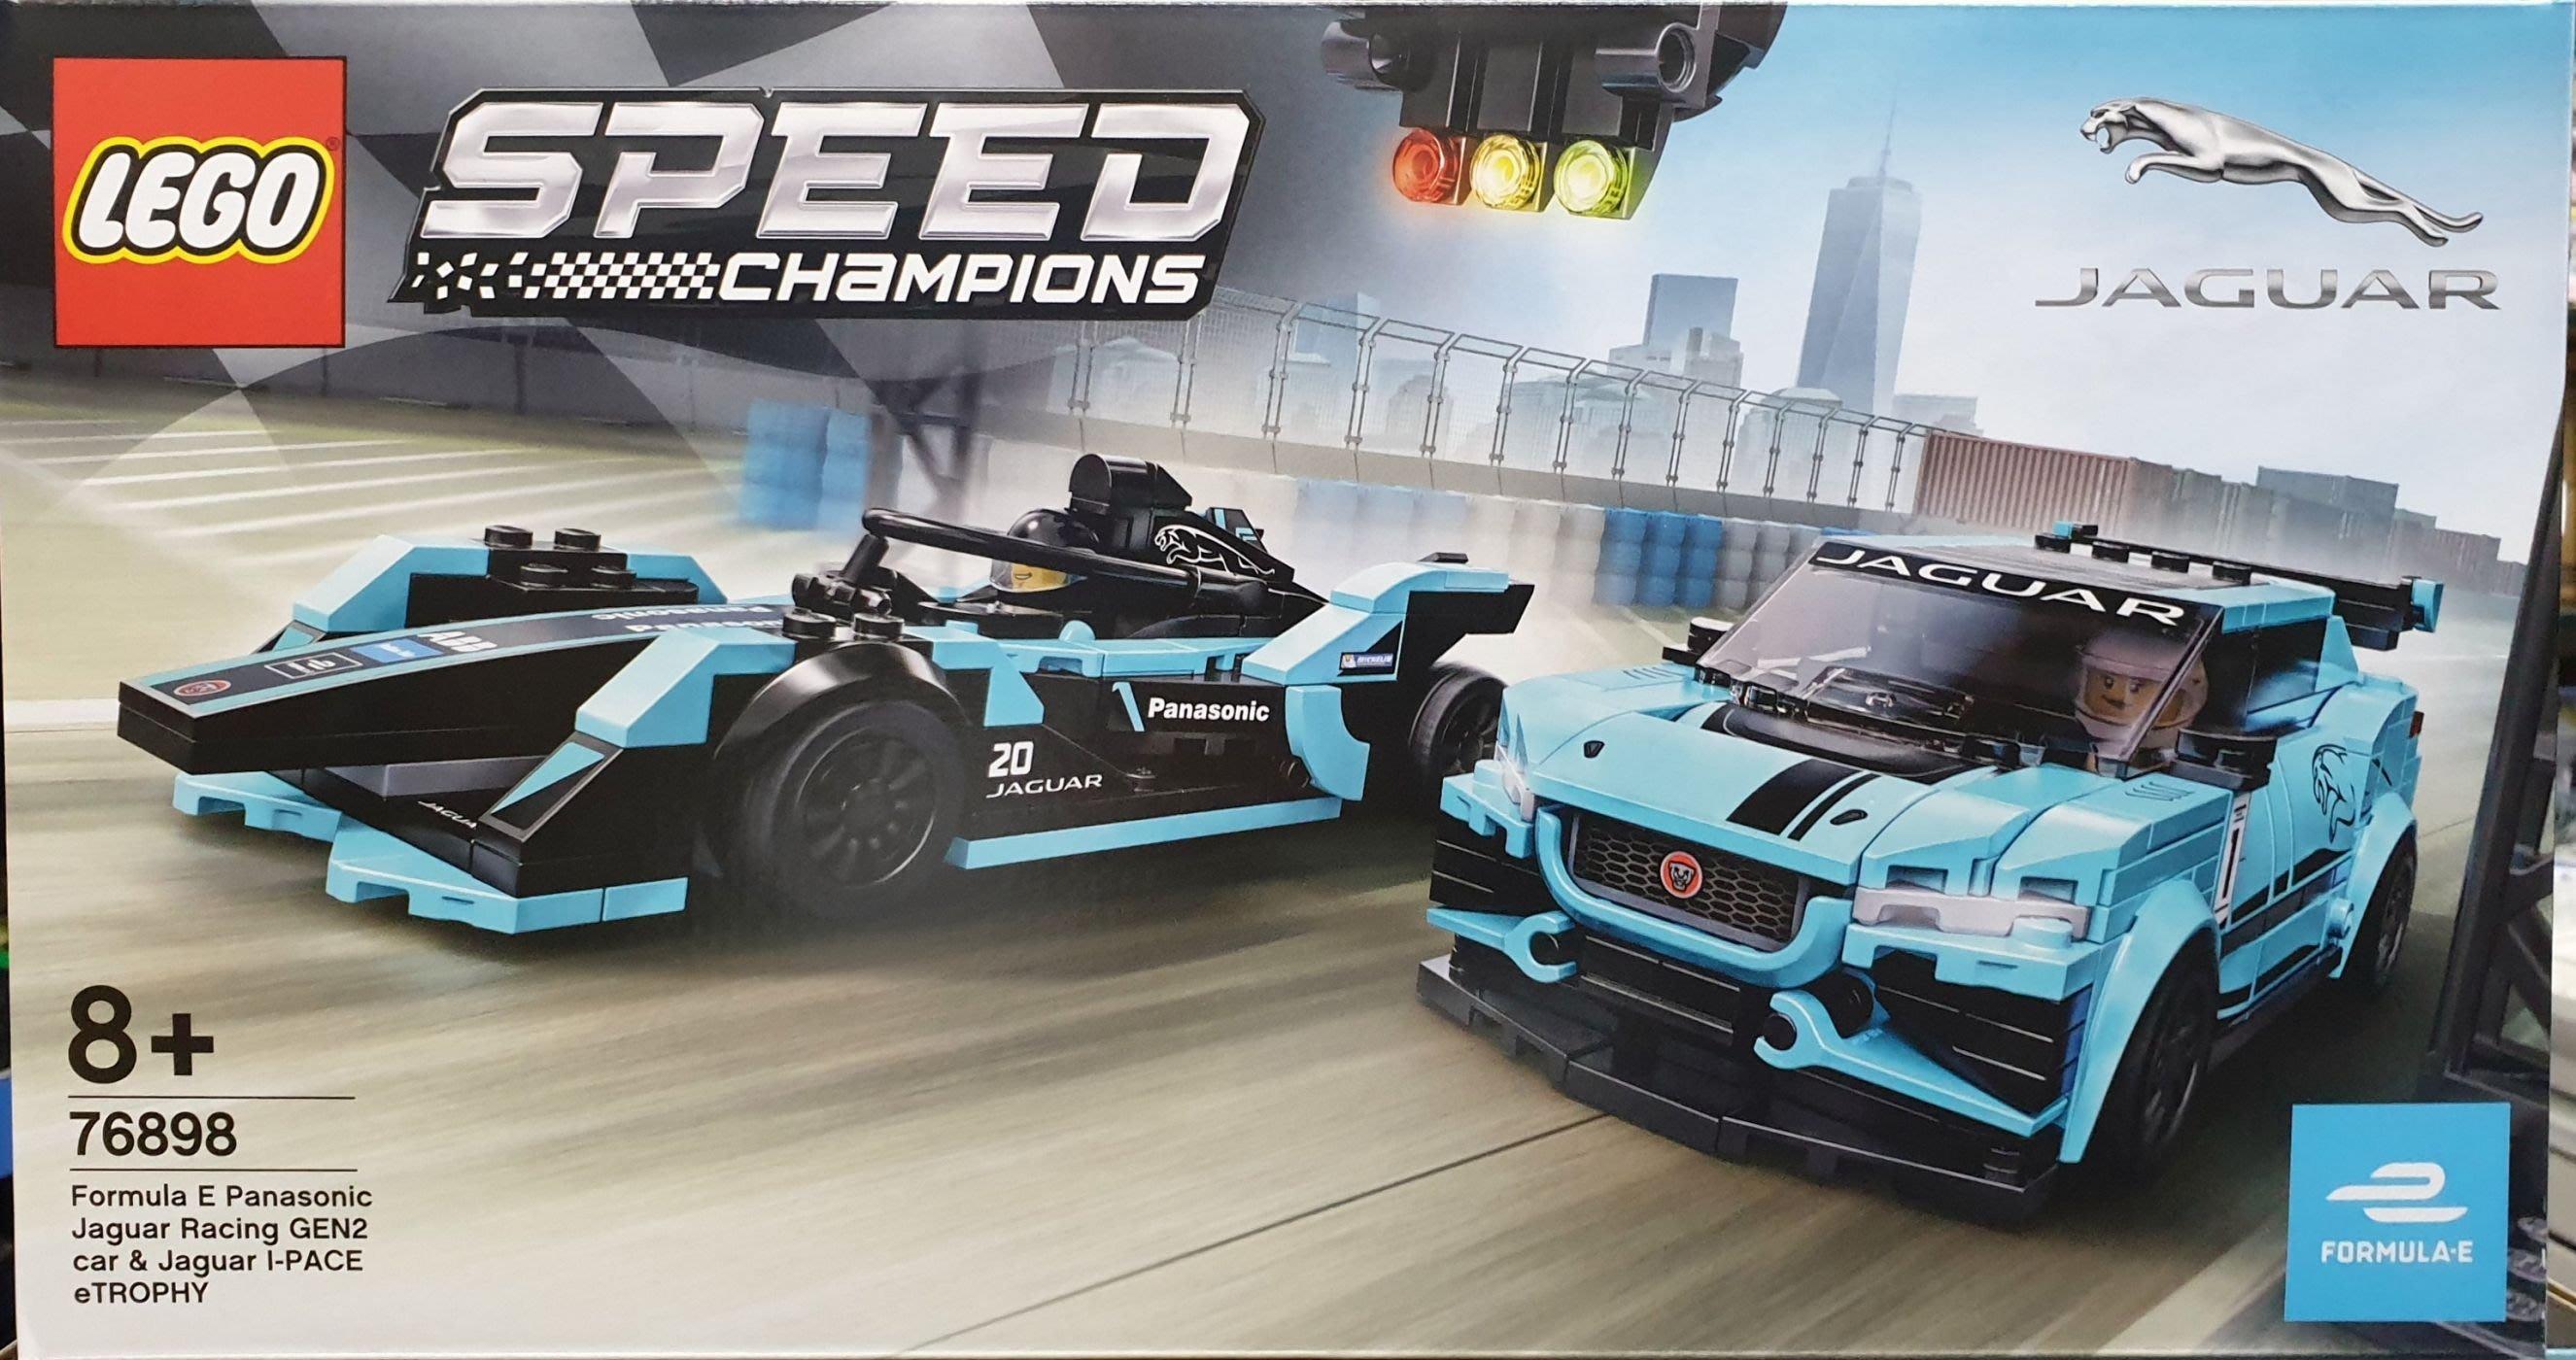 【鄭姐的店】樂高 76898 SPEED 系列 - Formula E Panasonic Jaguar Racing